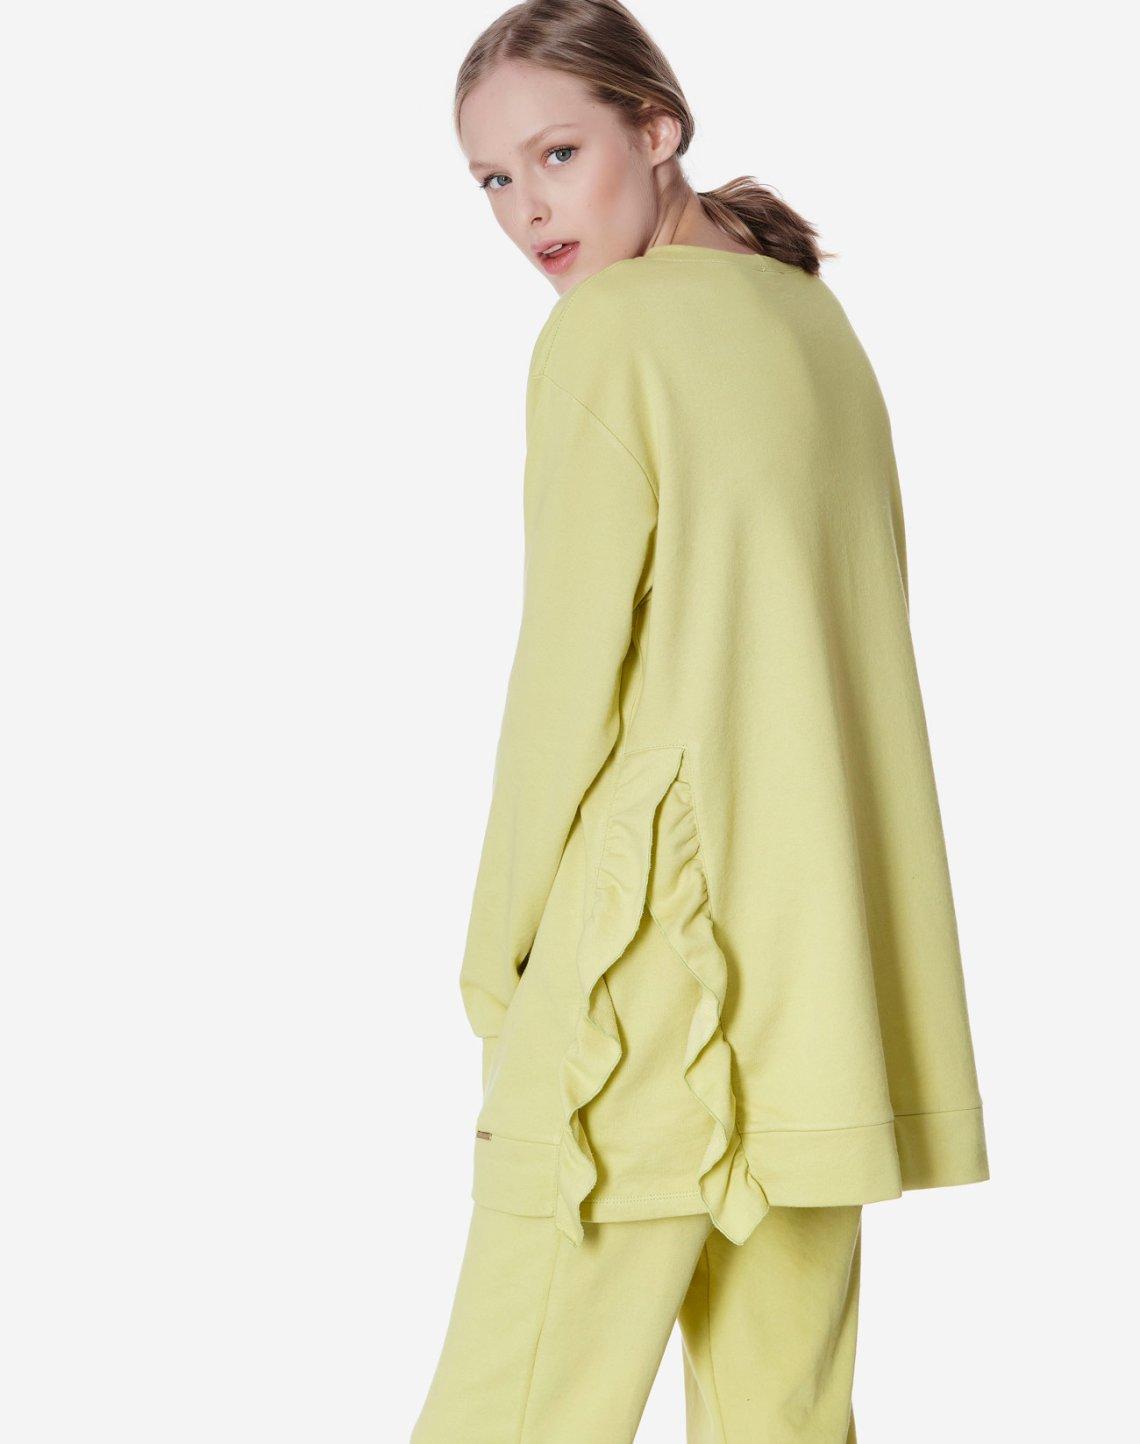 Sweatshirt with ruffles